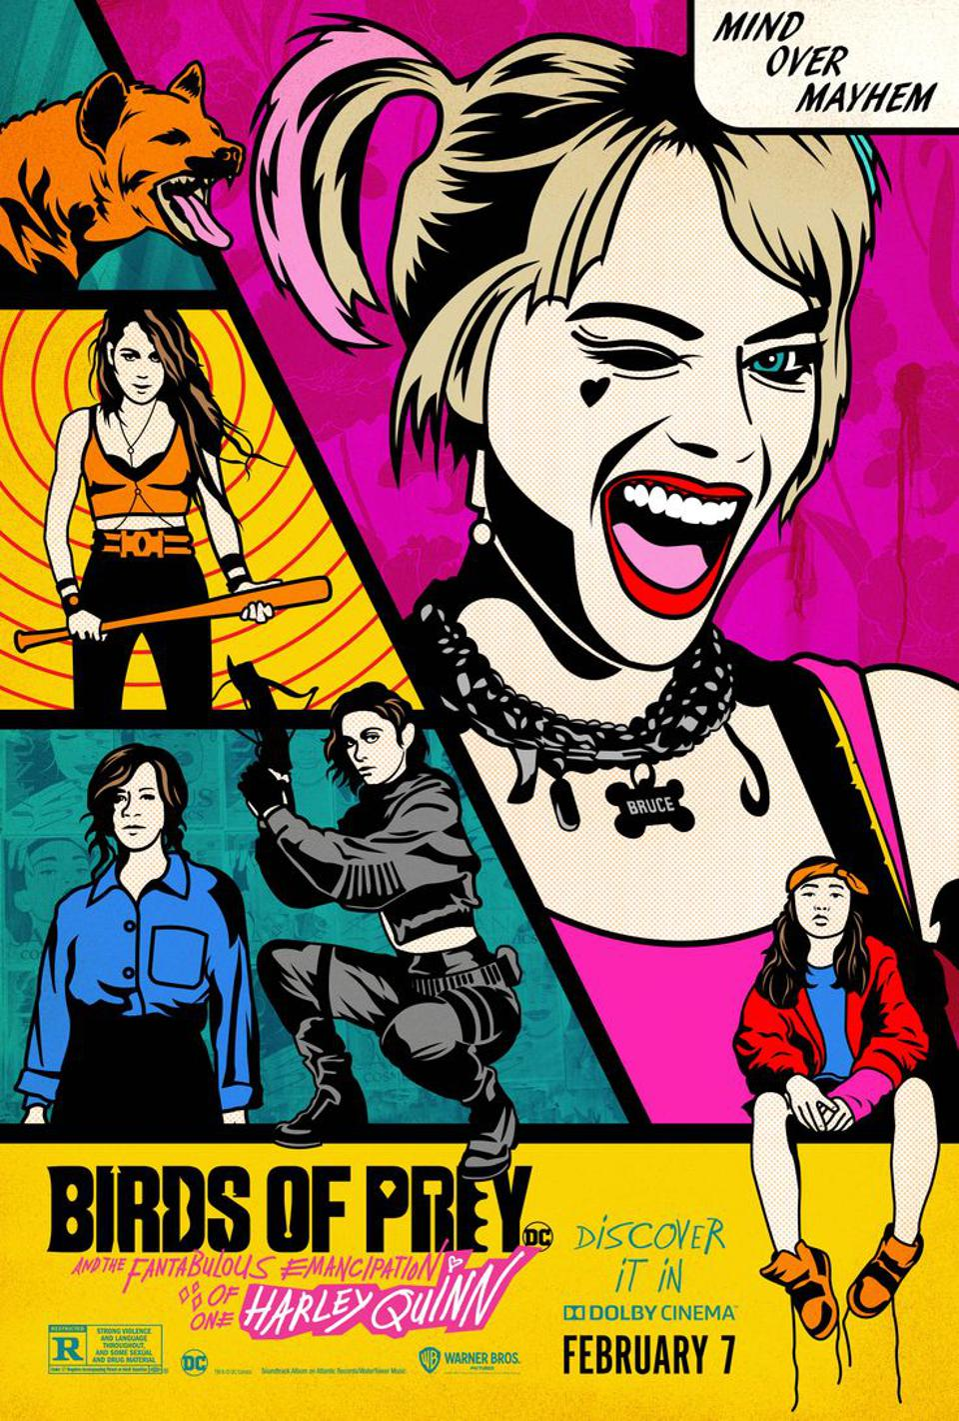 Official poster for Warner's ″Birds of Prey″